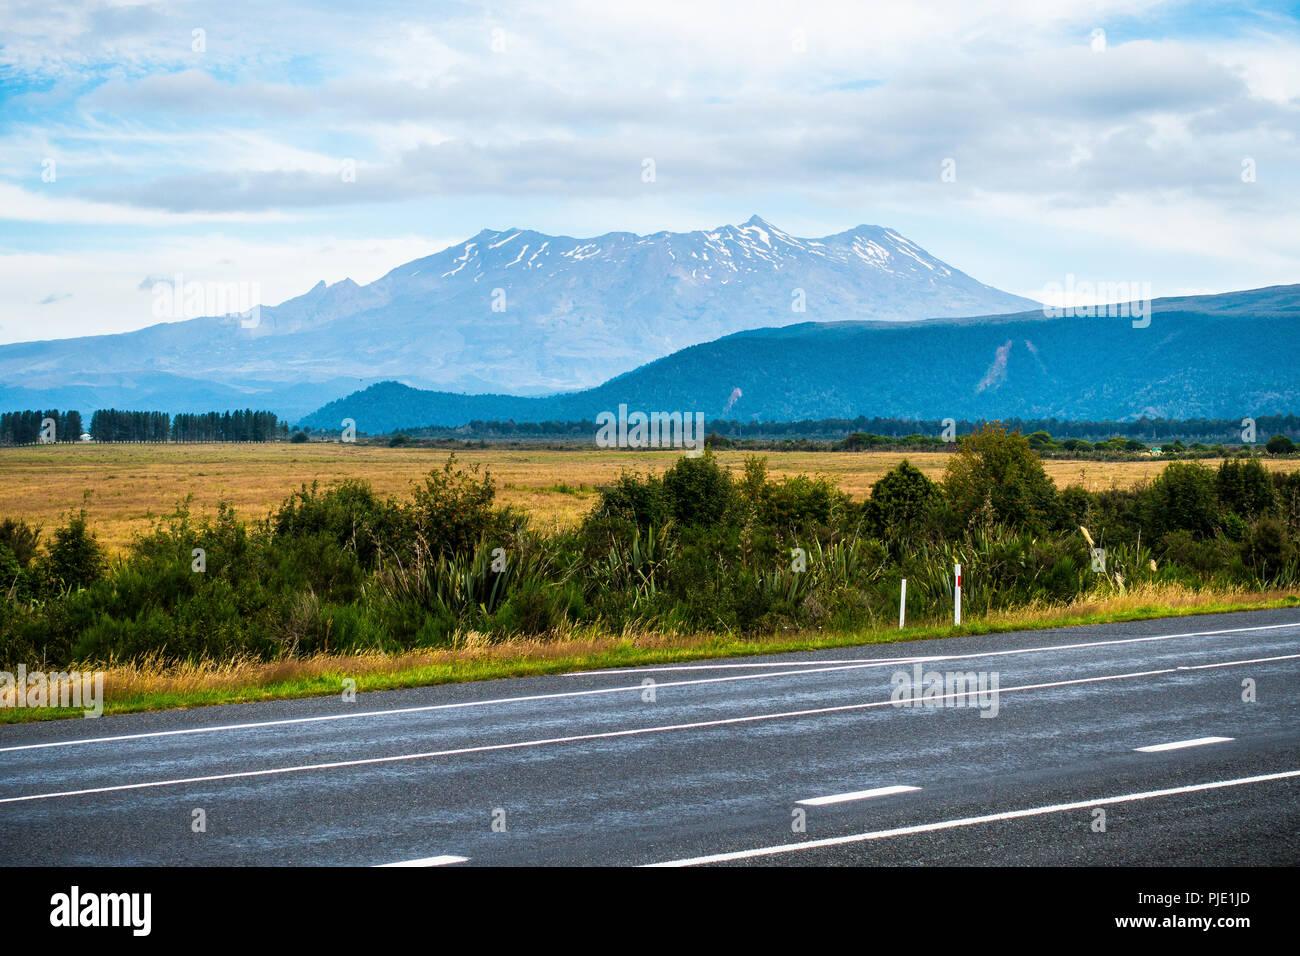 Mount Ruapehu - Tongariro National Park - Stock Image